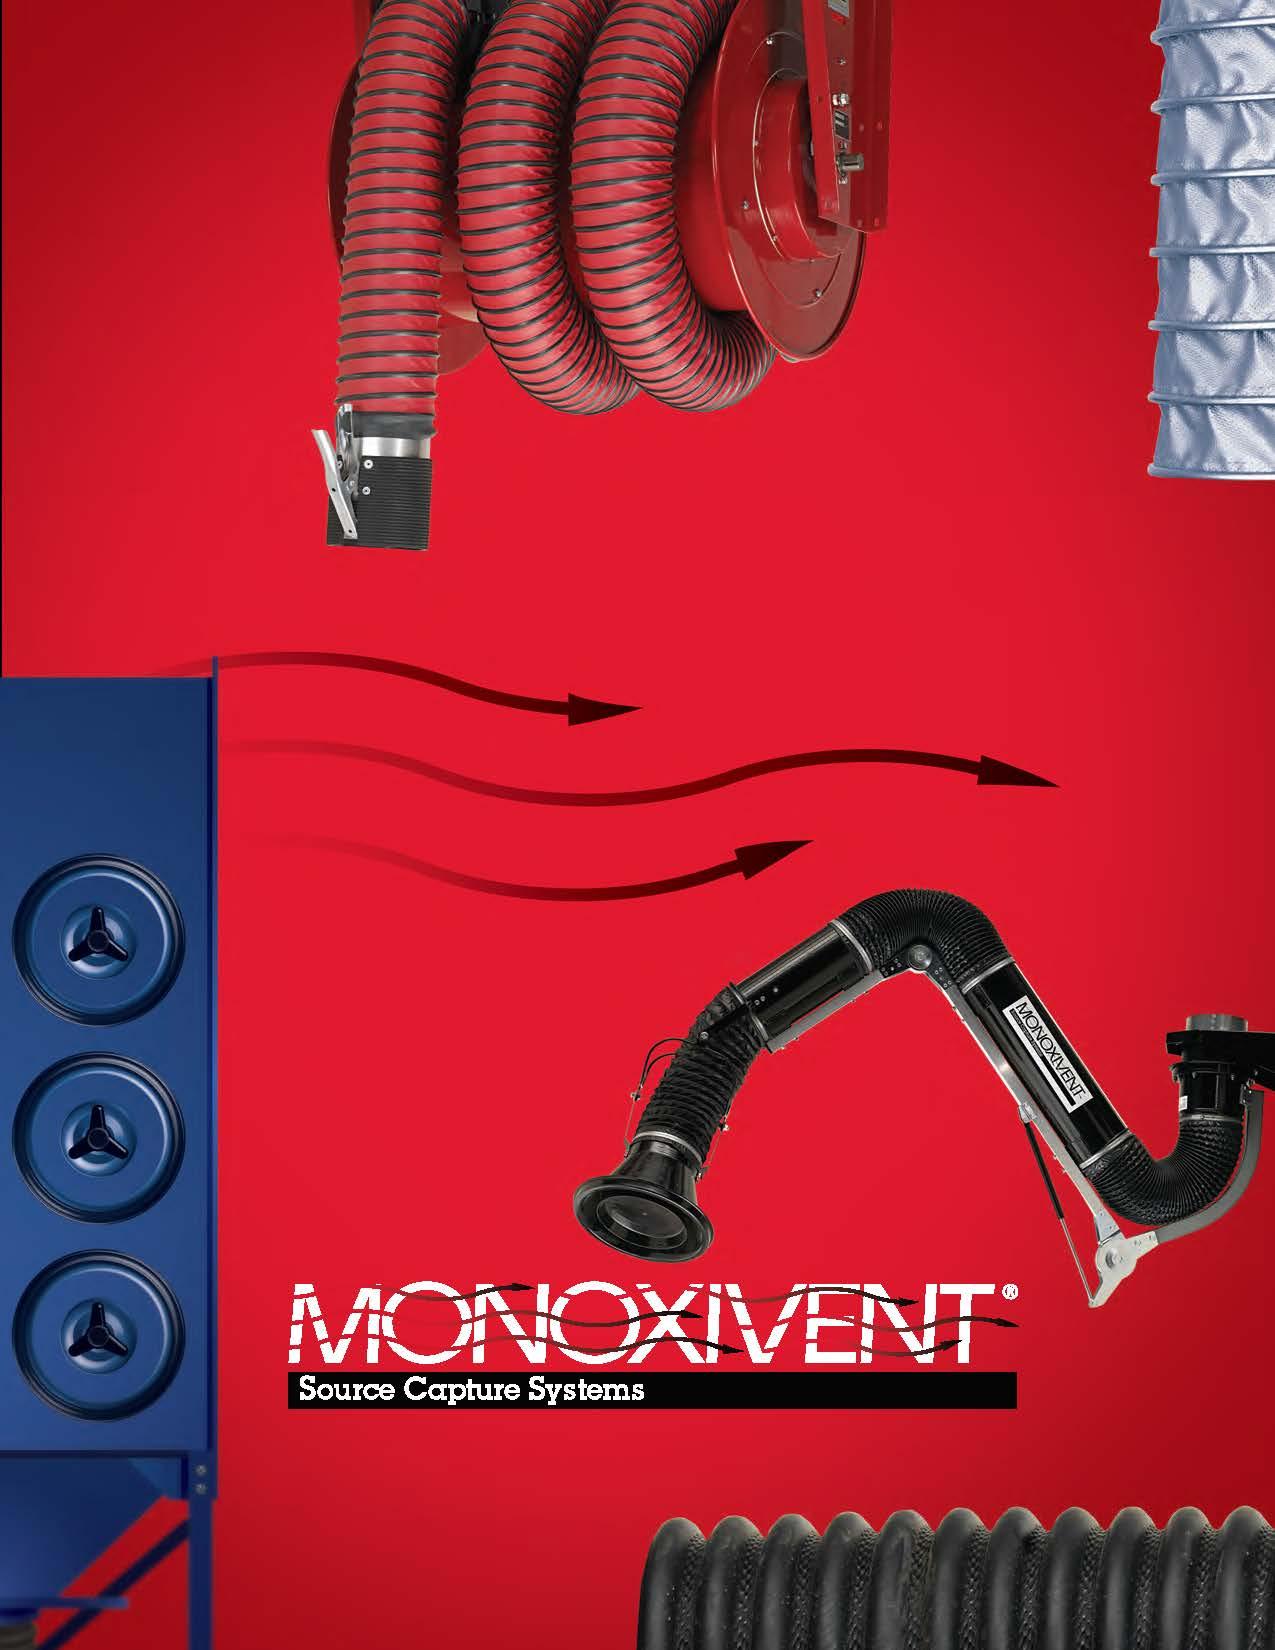 MONOXIVENT Represented by MSM in Wichita Kansas